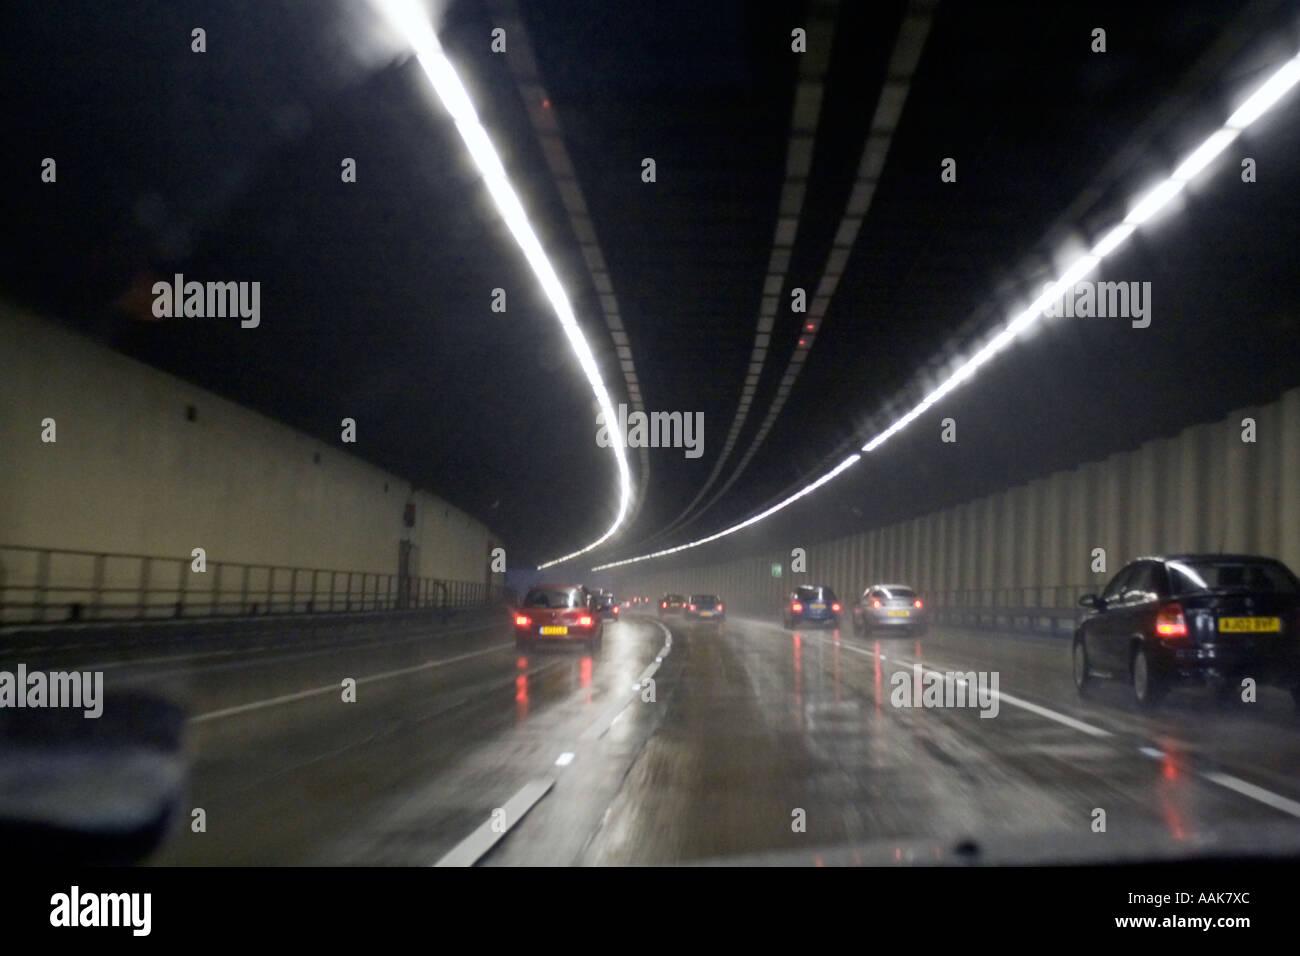 M-25 Orbital at night Tunnel London England United Kingdom - Stock Image